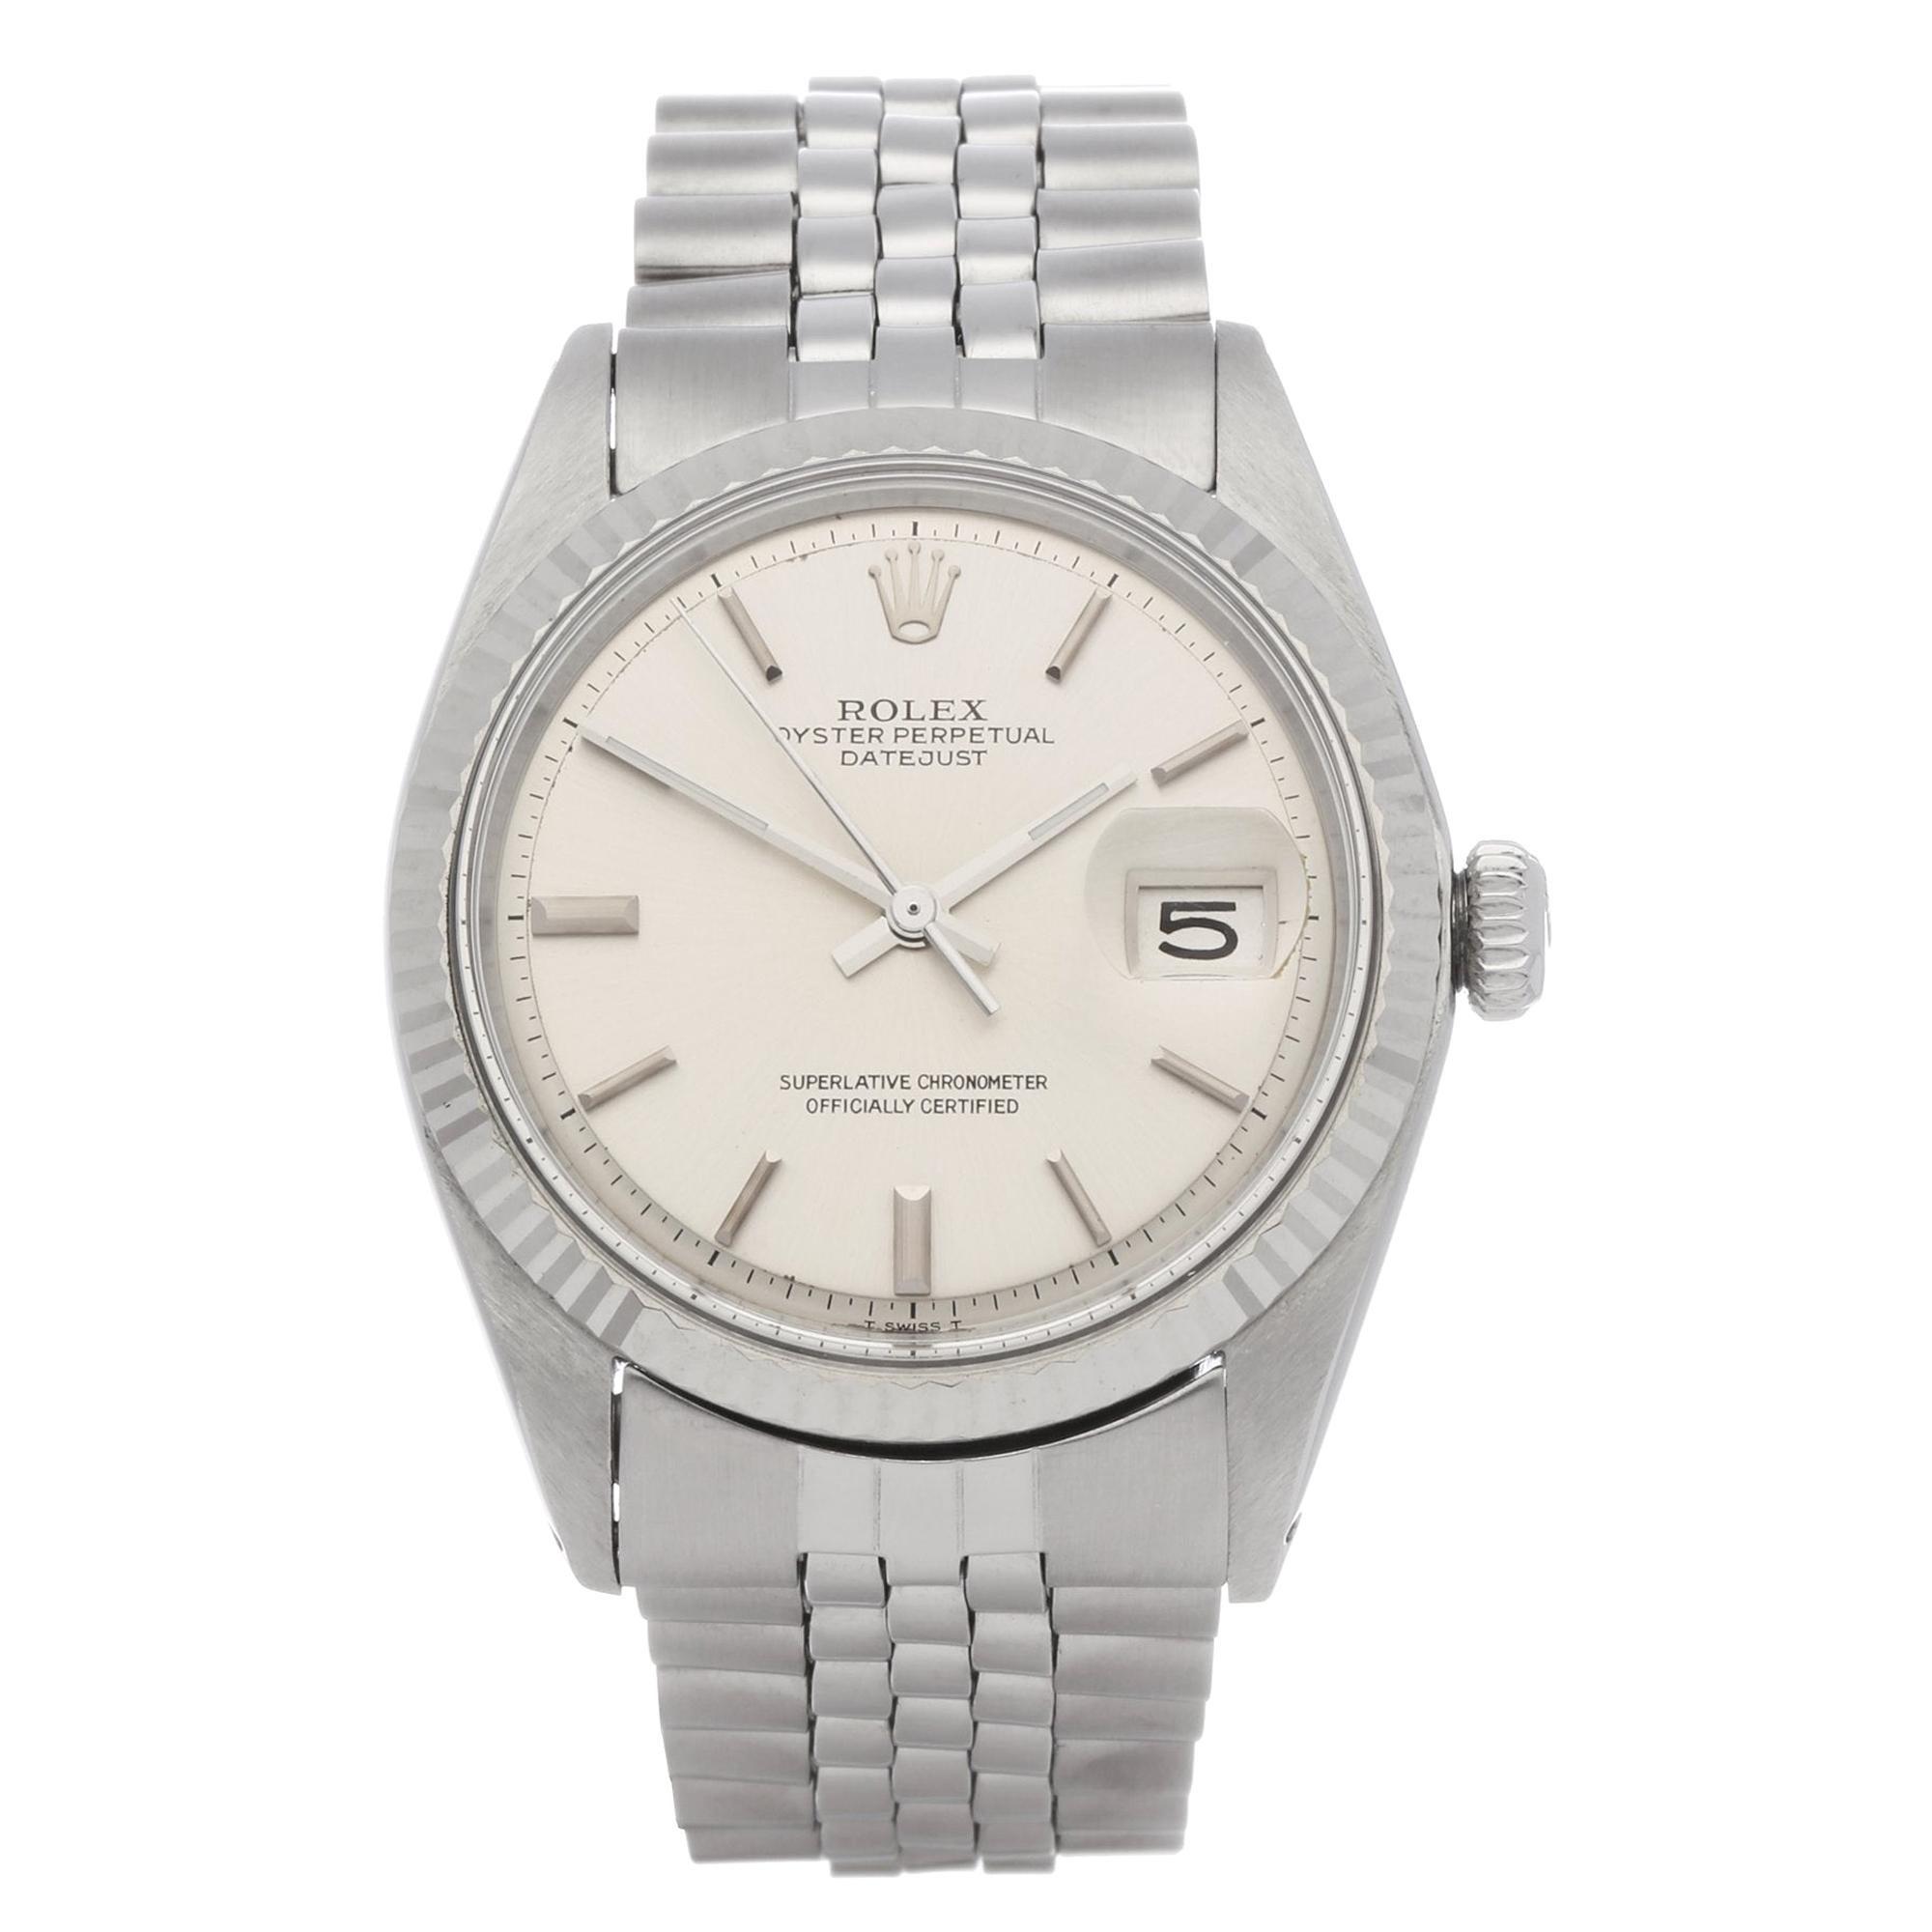 Rolex Datejust 36 1601 Men's White Gold & Stainless Steel Watch